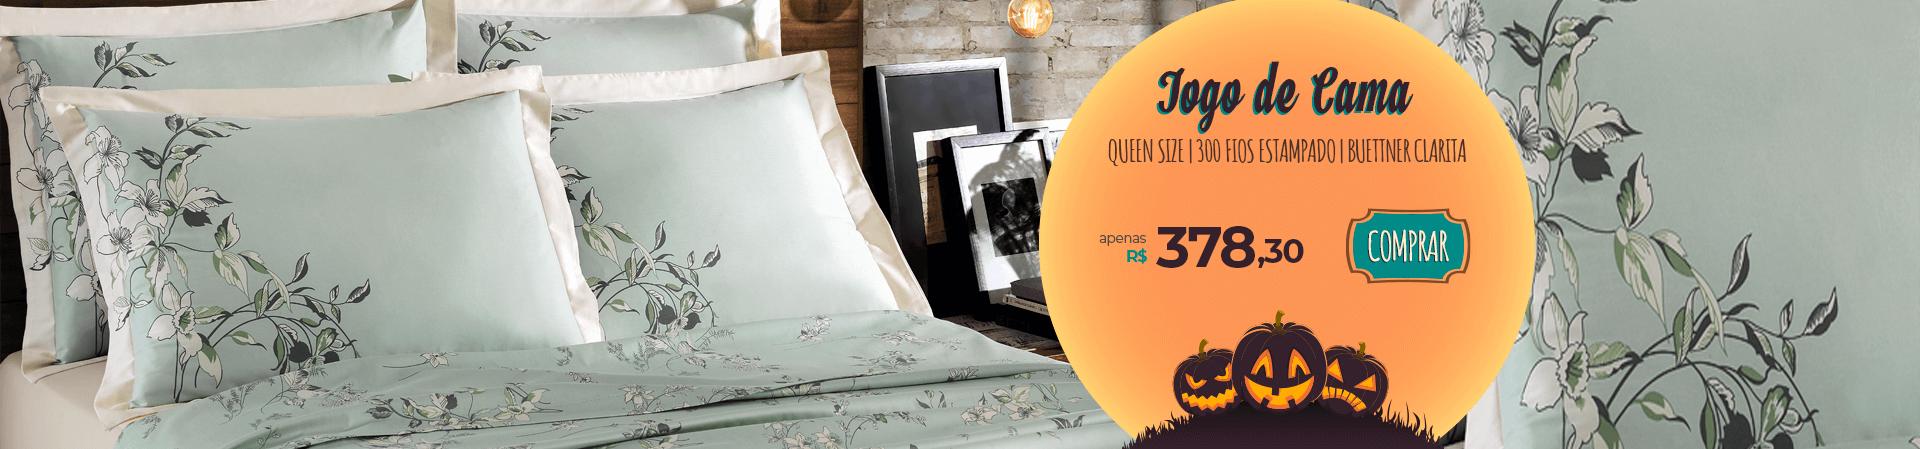 Jogo de Cama 300 fios Queen Size Buettner Clarita | Apenas R$378,30 | Halloween Loja Buettner | Compre Agora!